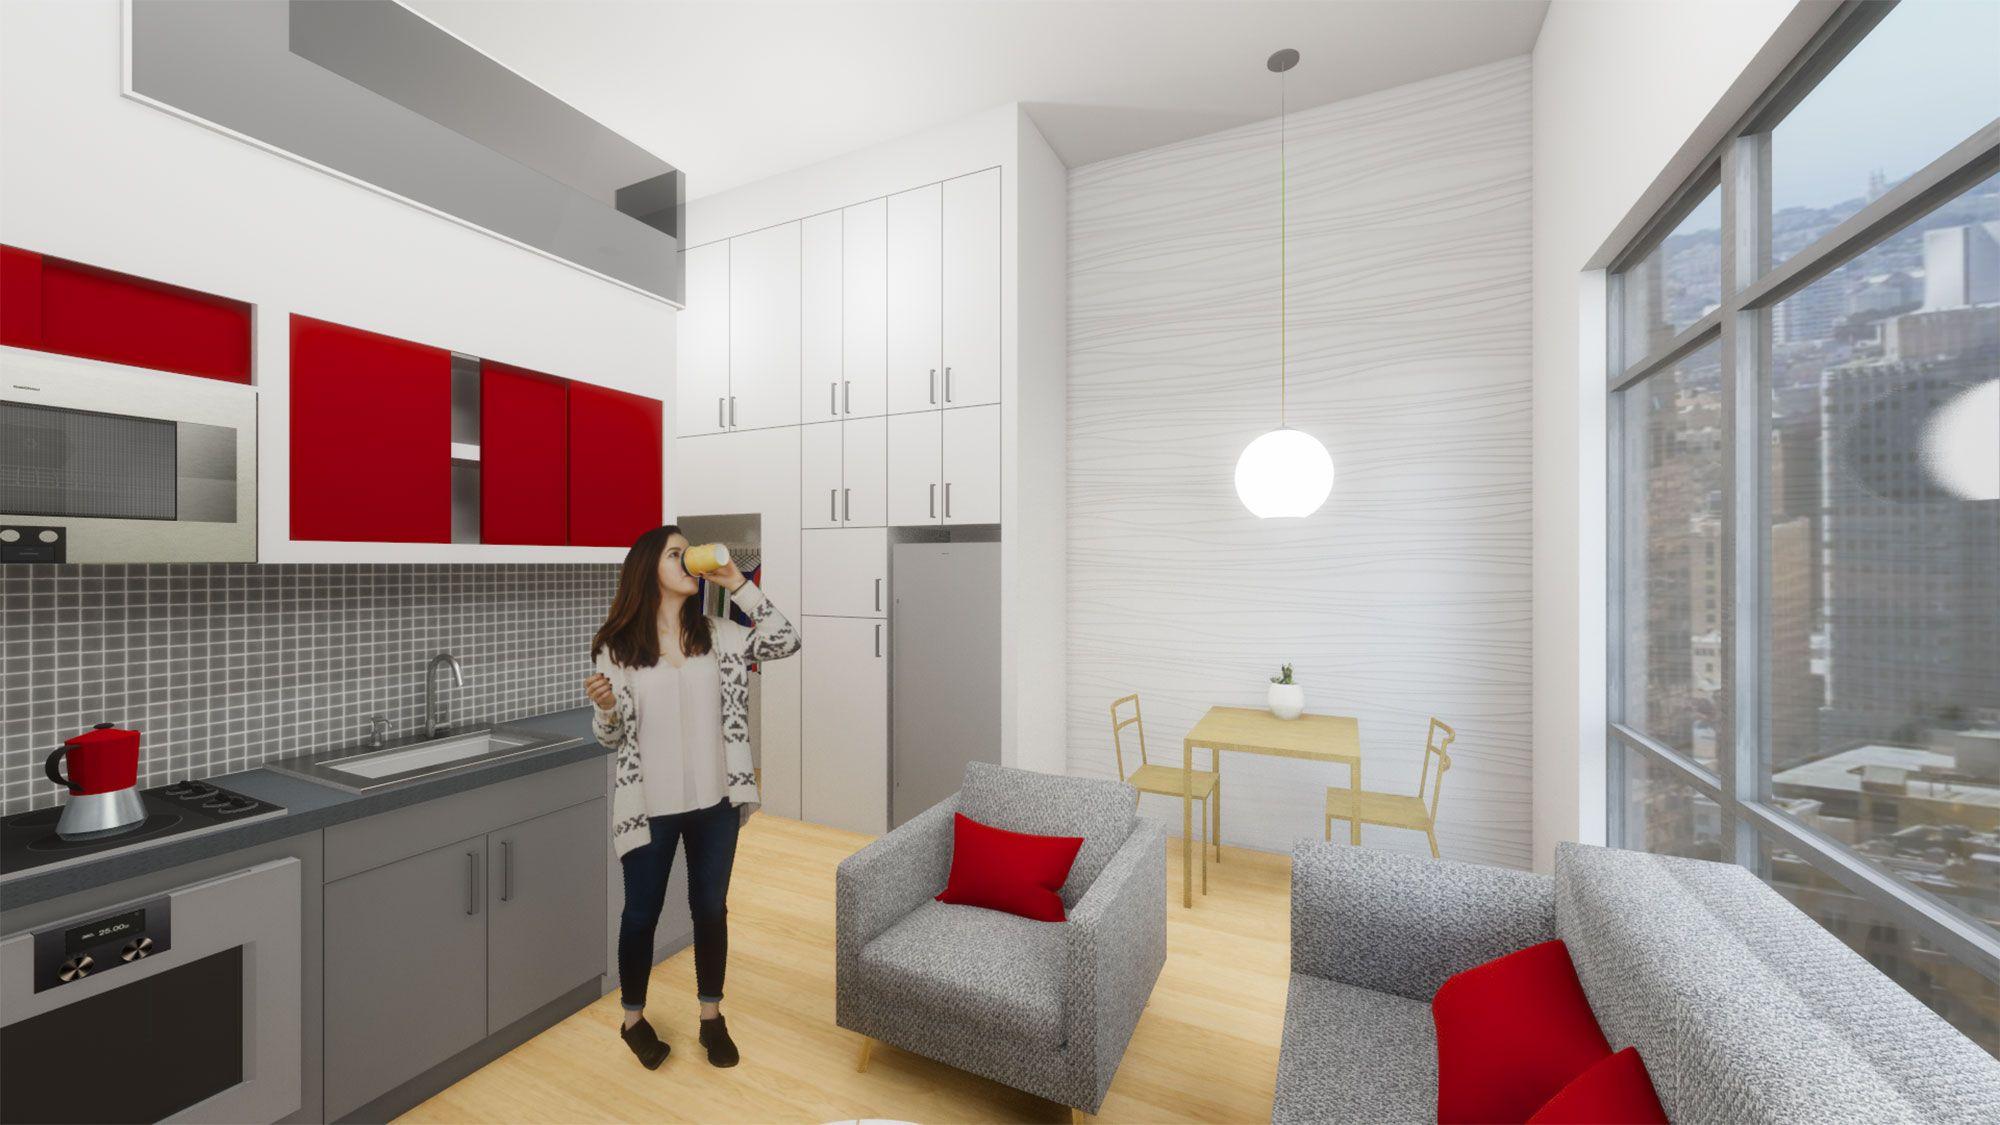 Micro Apartments Apartment Design Architecture Plan Micro